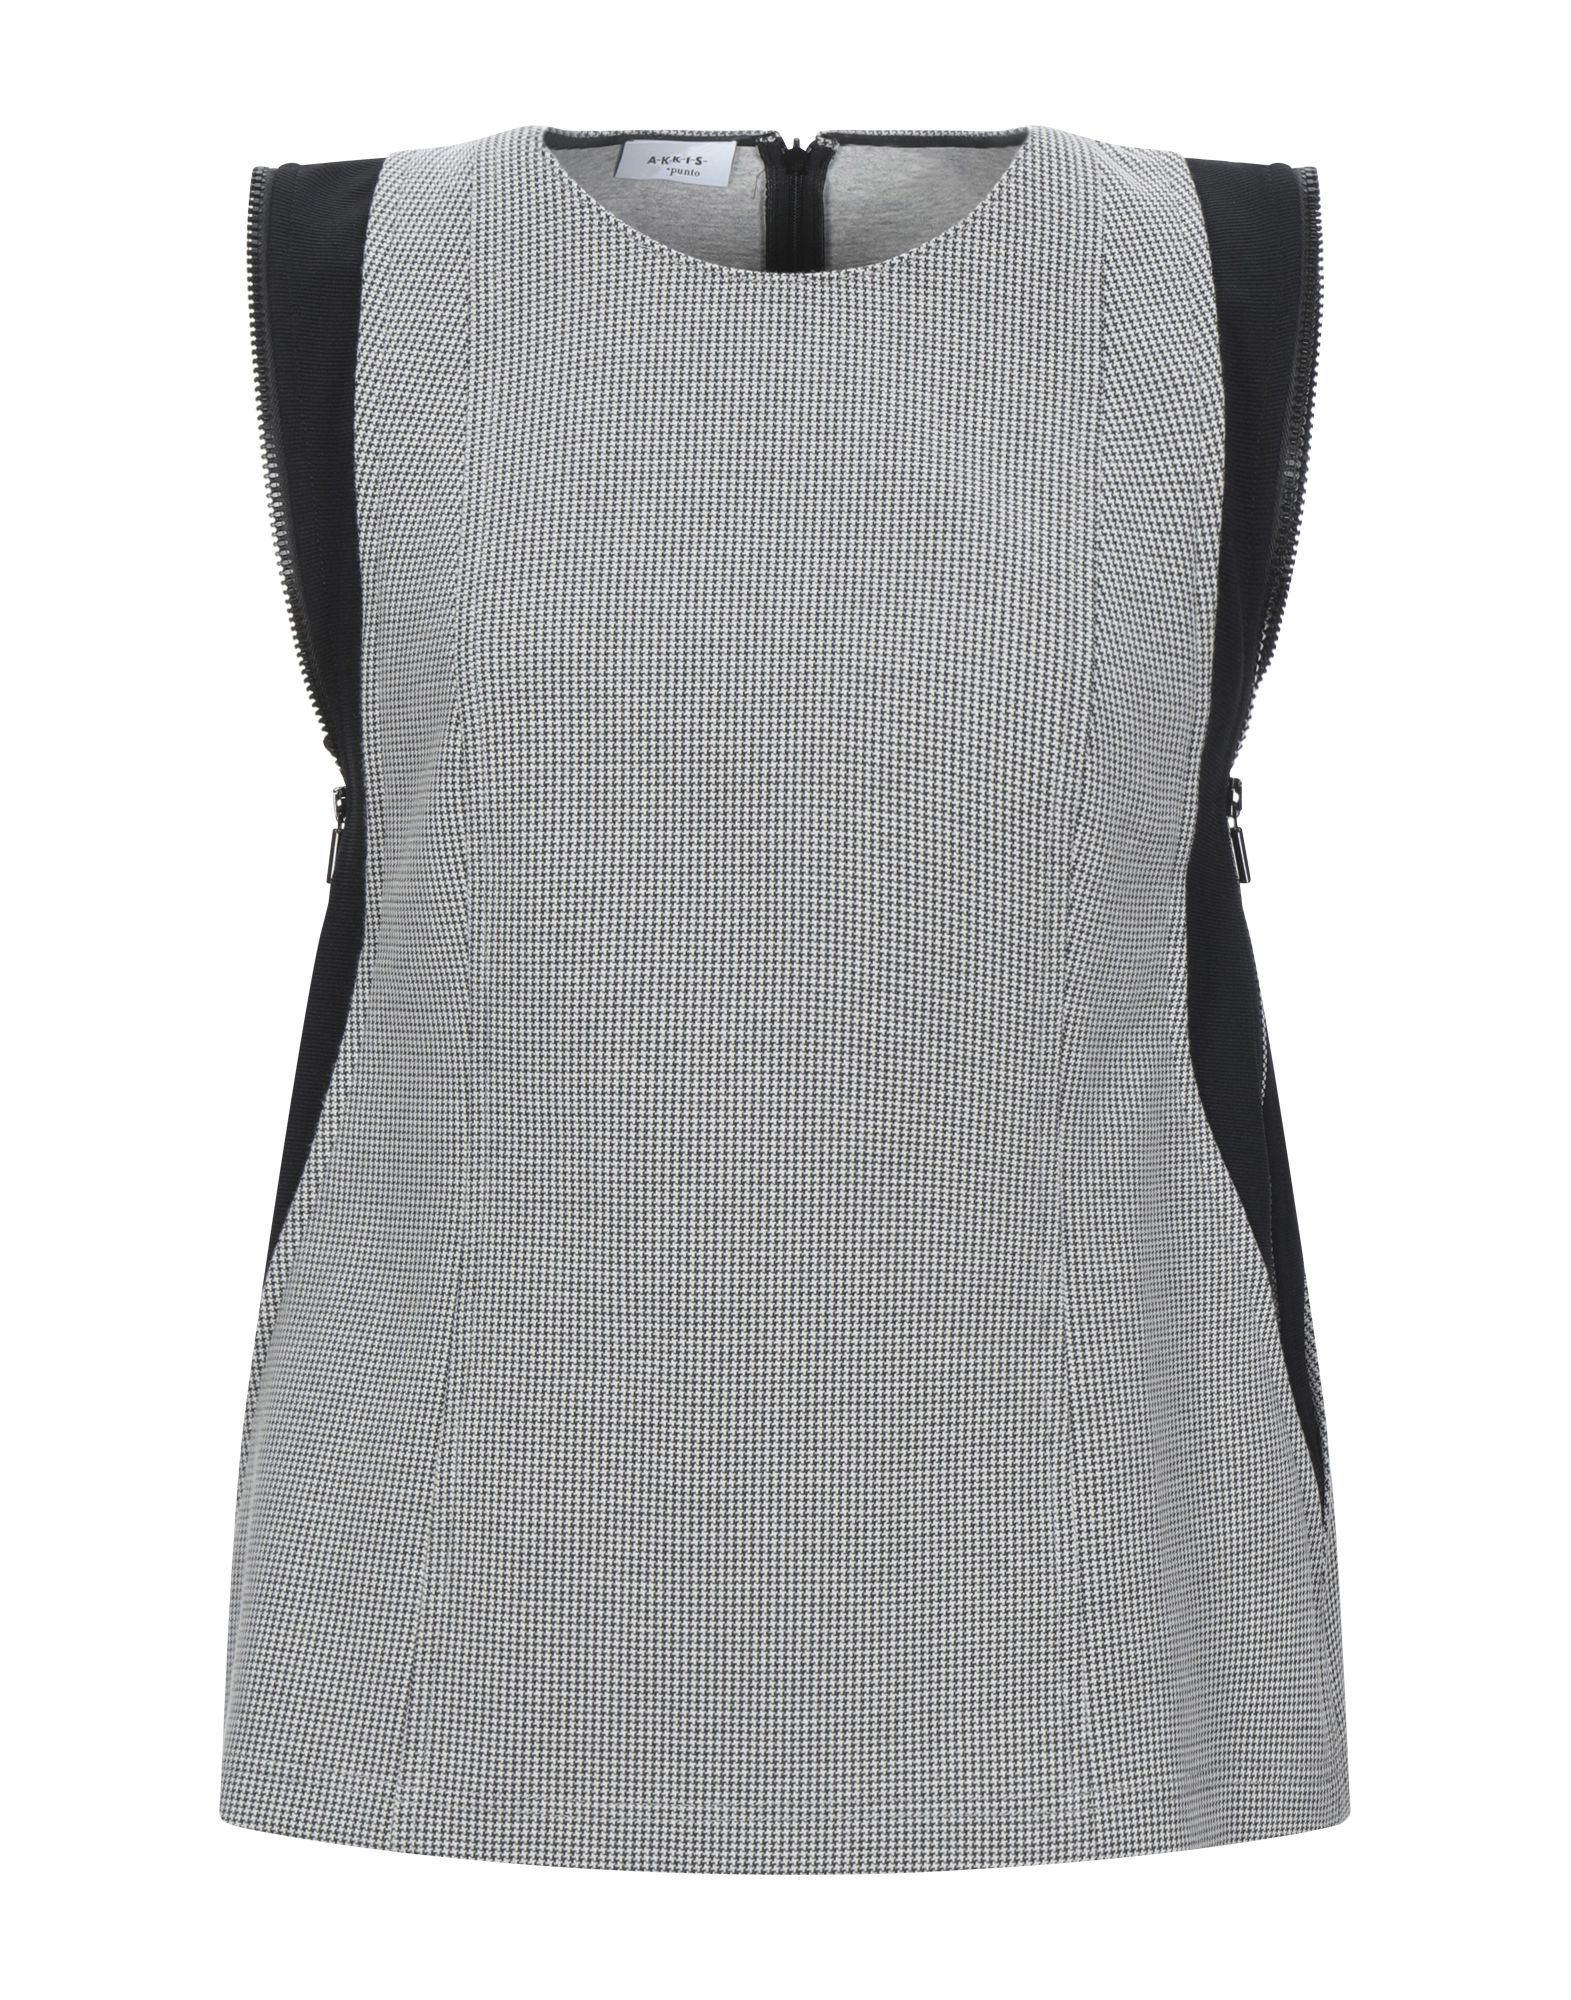 AKRIS PUNTO Tops. sweatshirt fleece, no appliqués, houndstooth, round collar, sleeveless, rear closure, zipper closure, no pockets. 51% Polyester, 46% Cotton, 3% Polyamide, Elastane